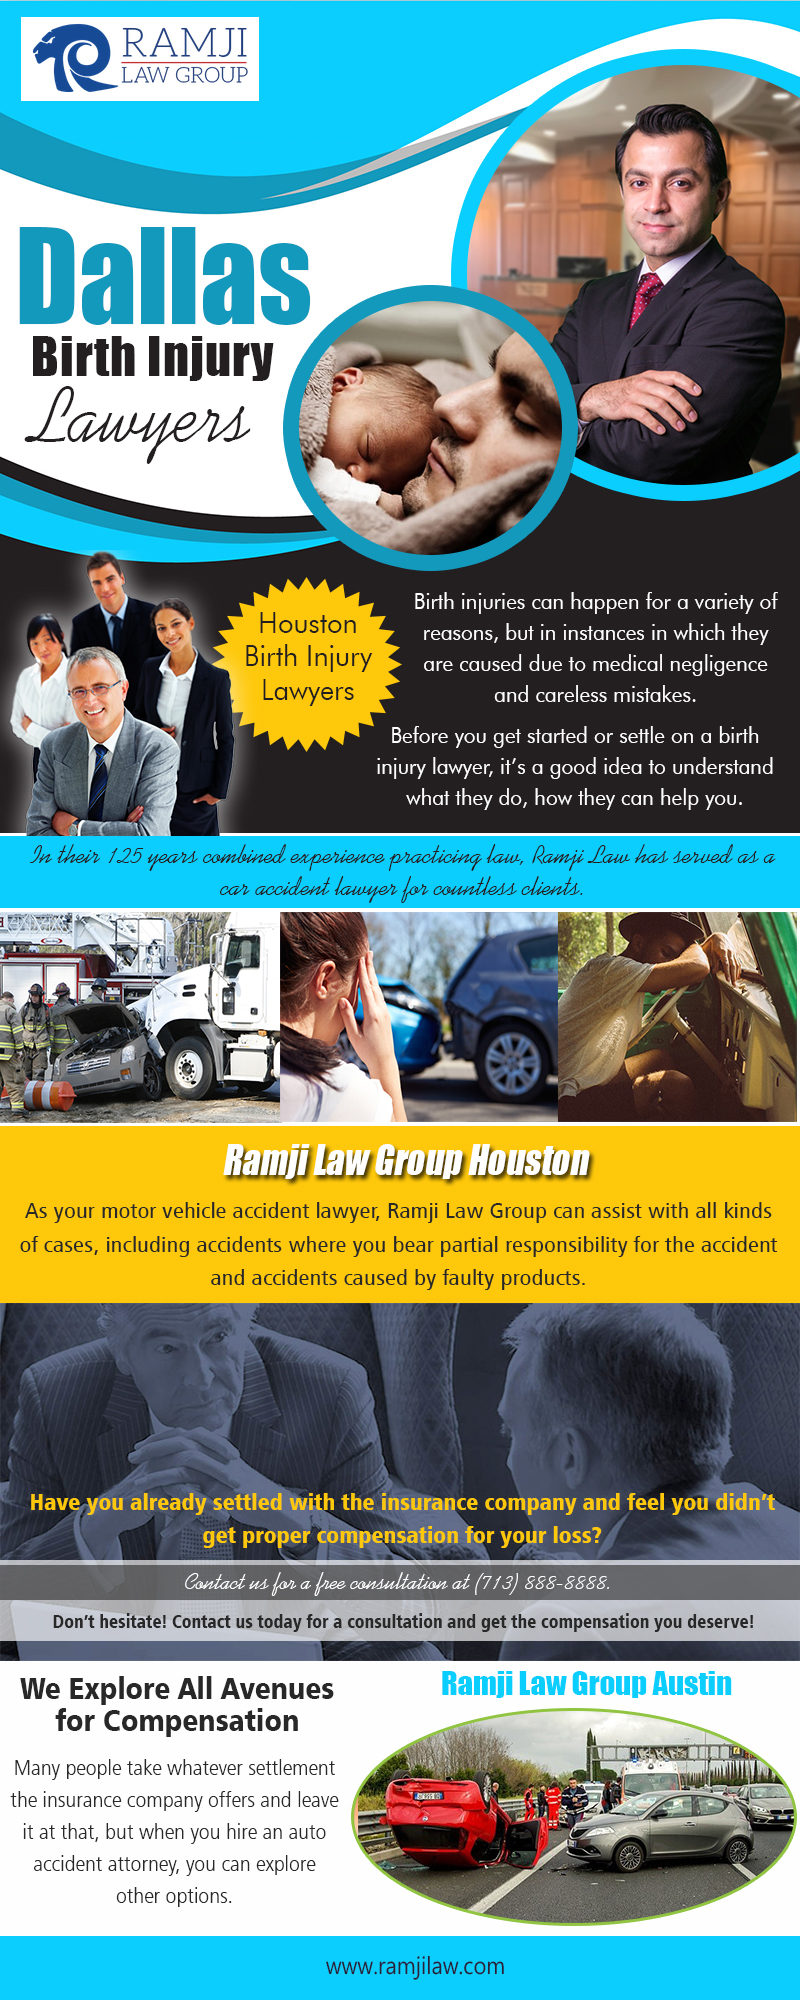 Dallas Birth Injury Lawyers | ramjilaw.com